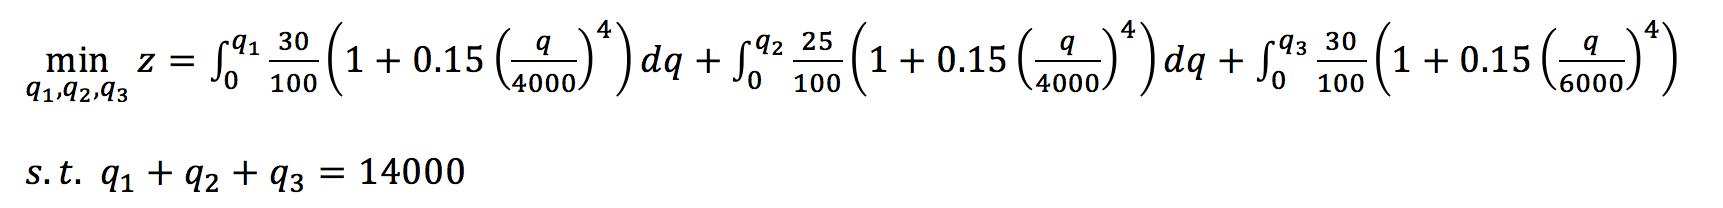 How Can I Solve Optimization Problem Without Using Symbolic Math